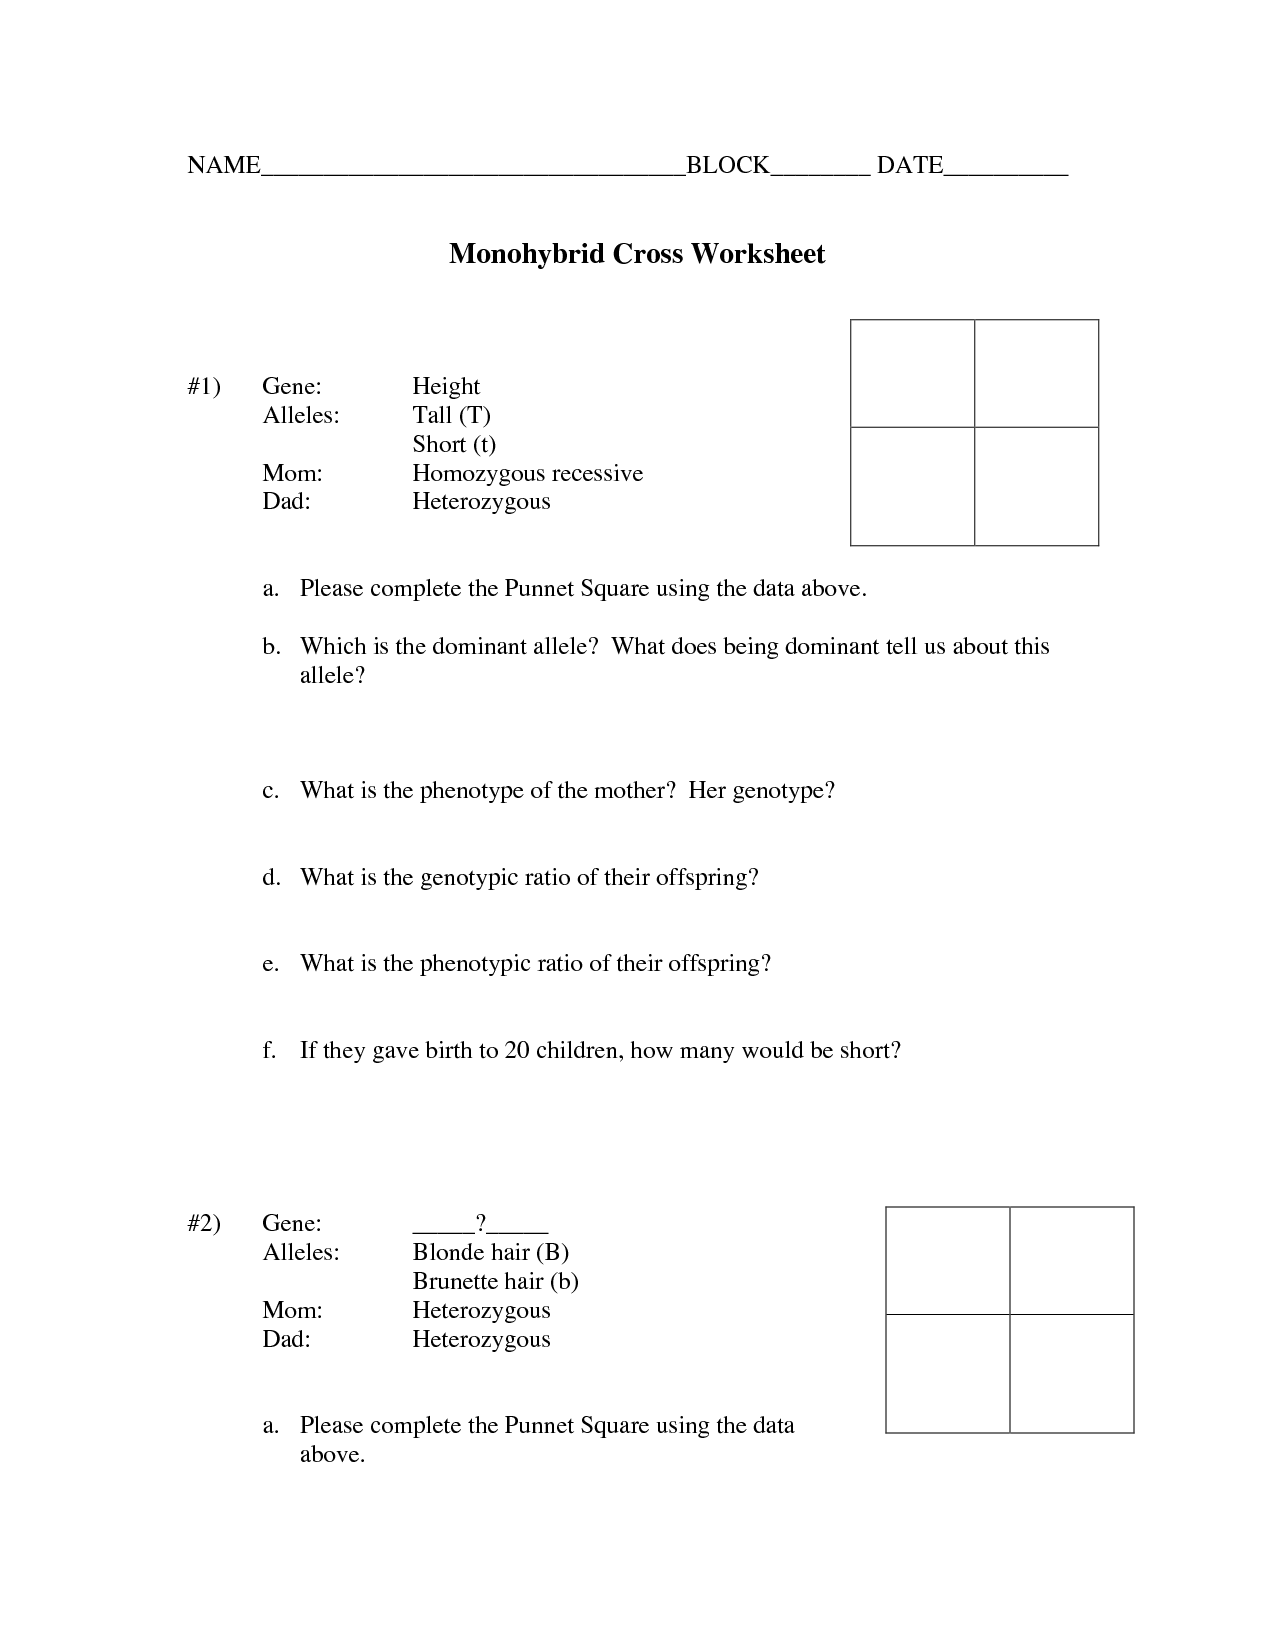 15 Best Images of Dihybrid Cross Worksheet Answers  Dihybrid Cross Worksheet Answer Key